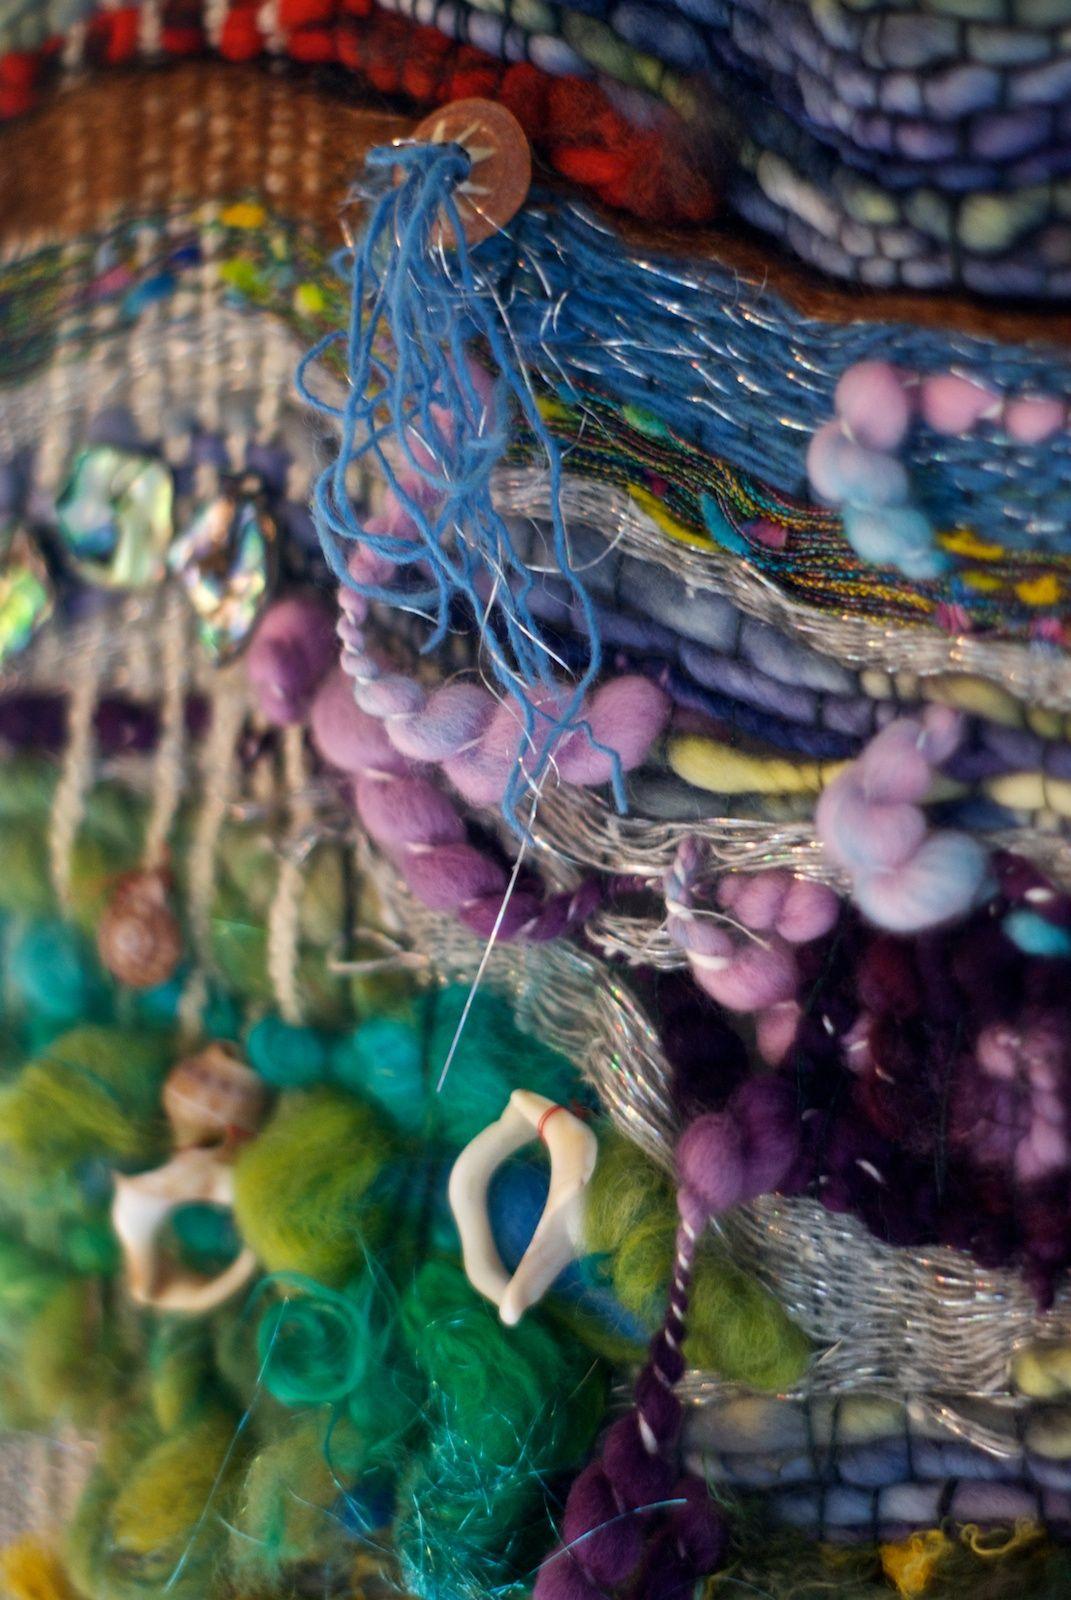 free form weaving  WoolWench Freeform Weaving | Loom weaving, Weaving textiles ...